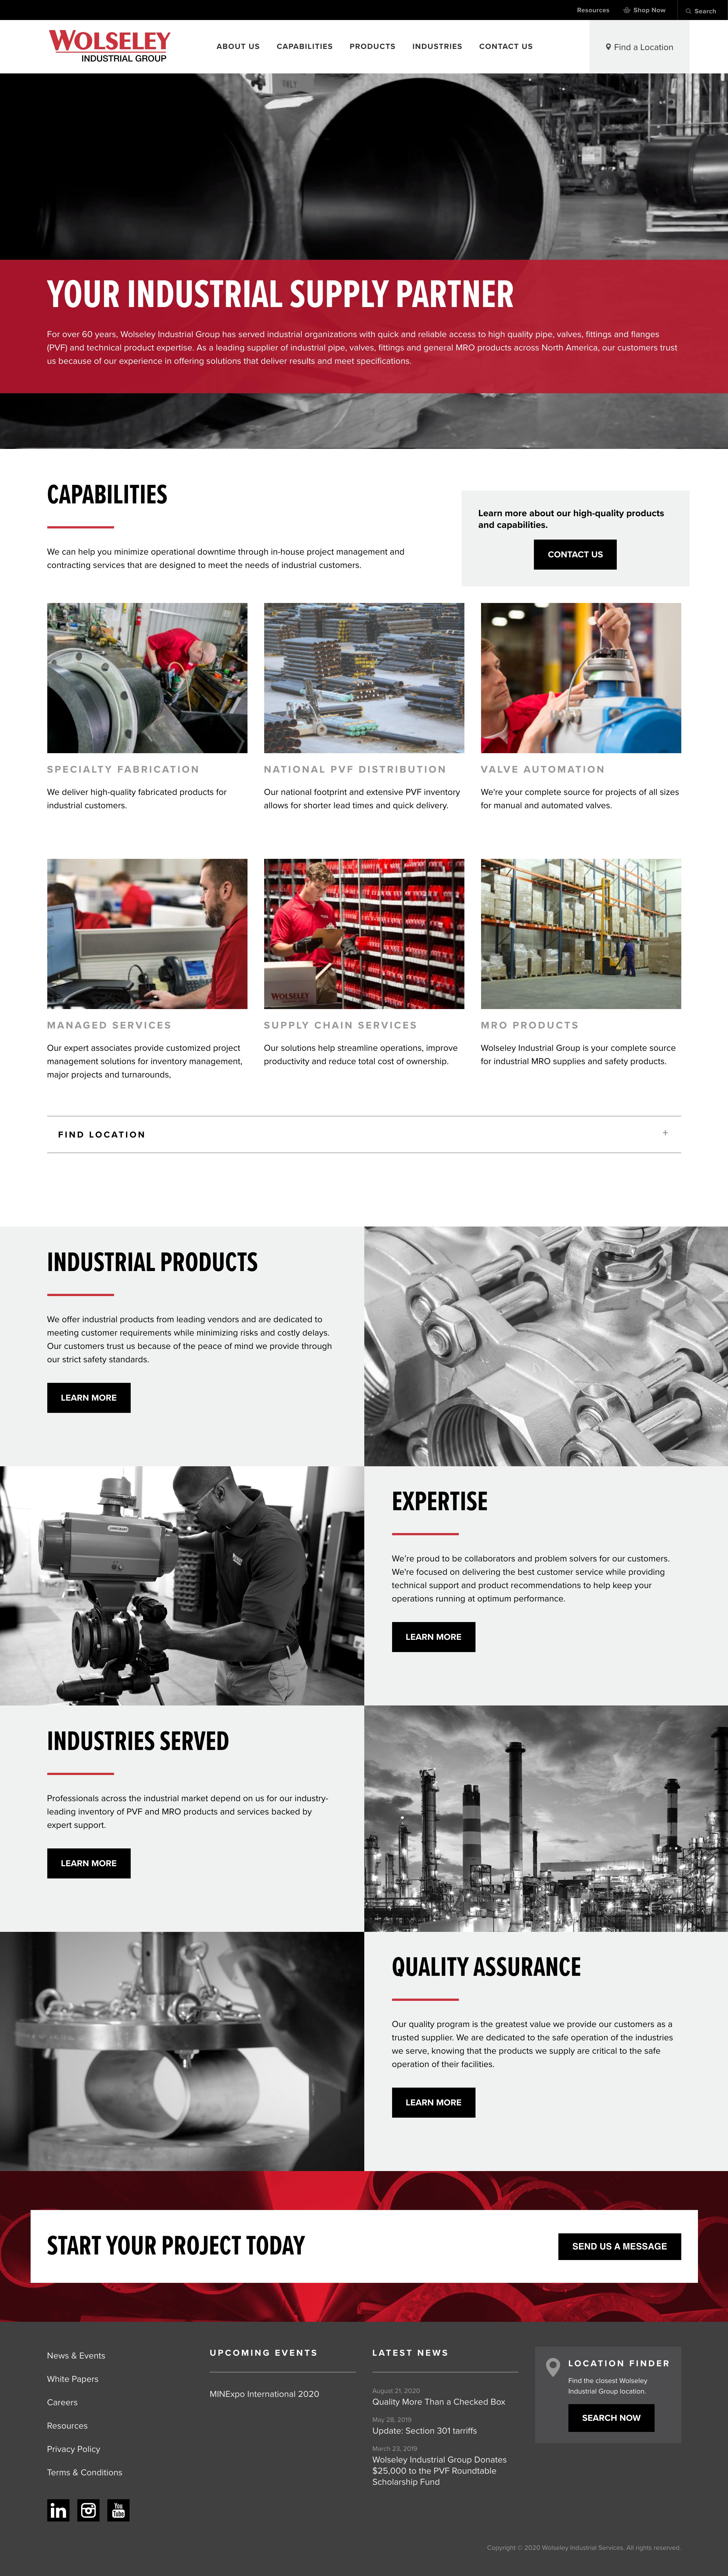 Website Design & Development for Wolseley Industrial Group